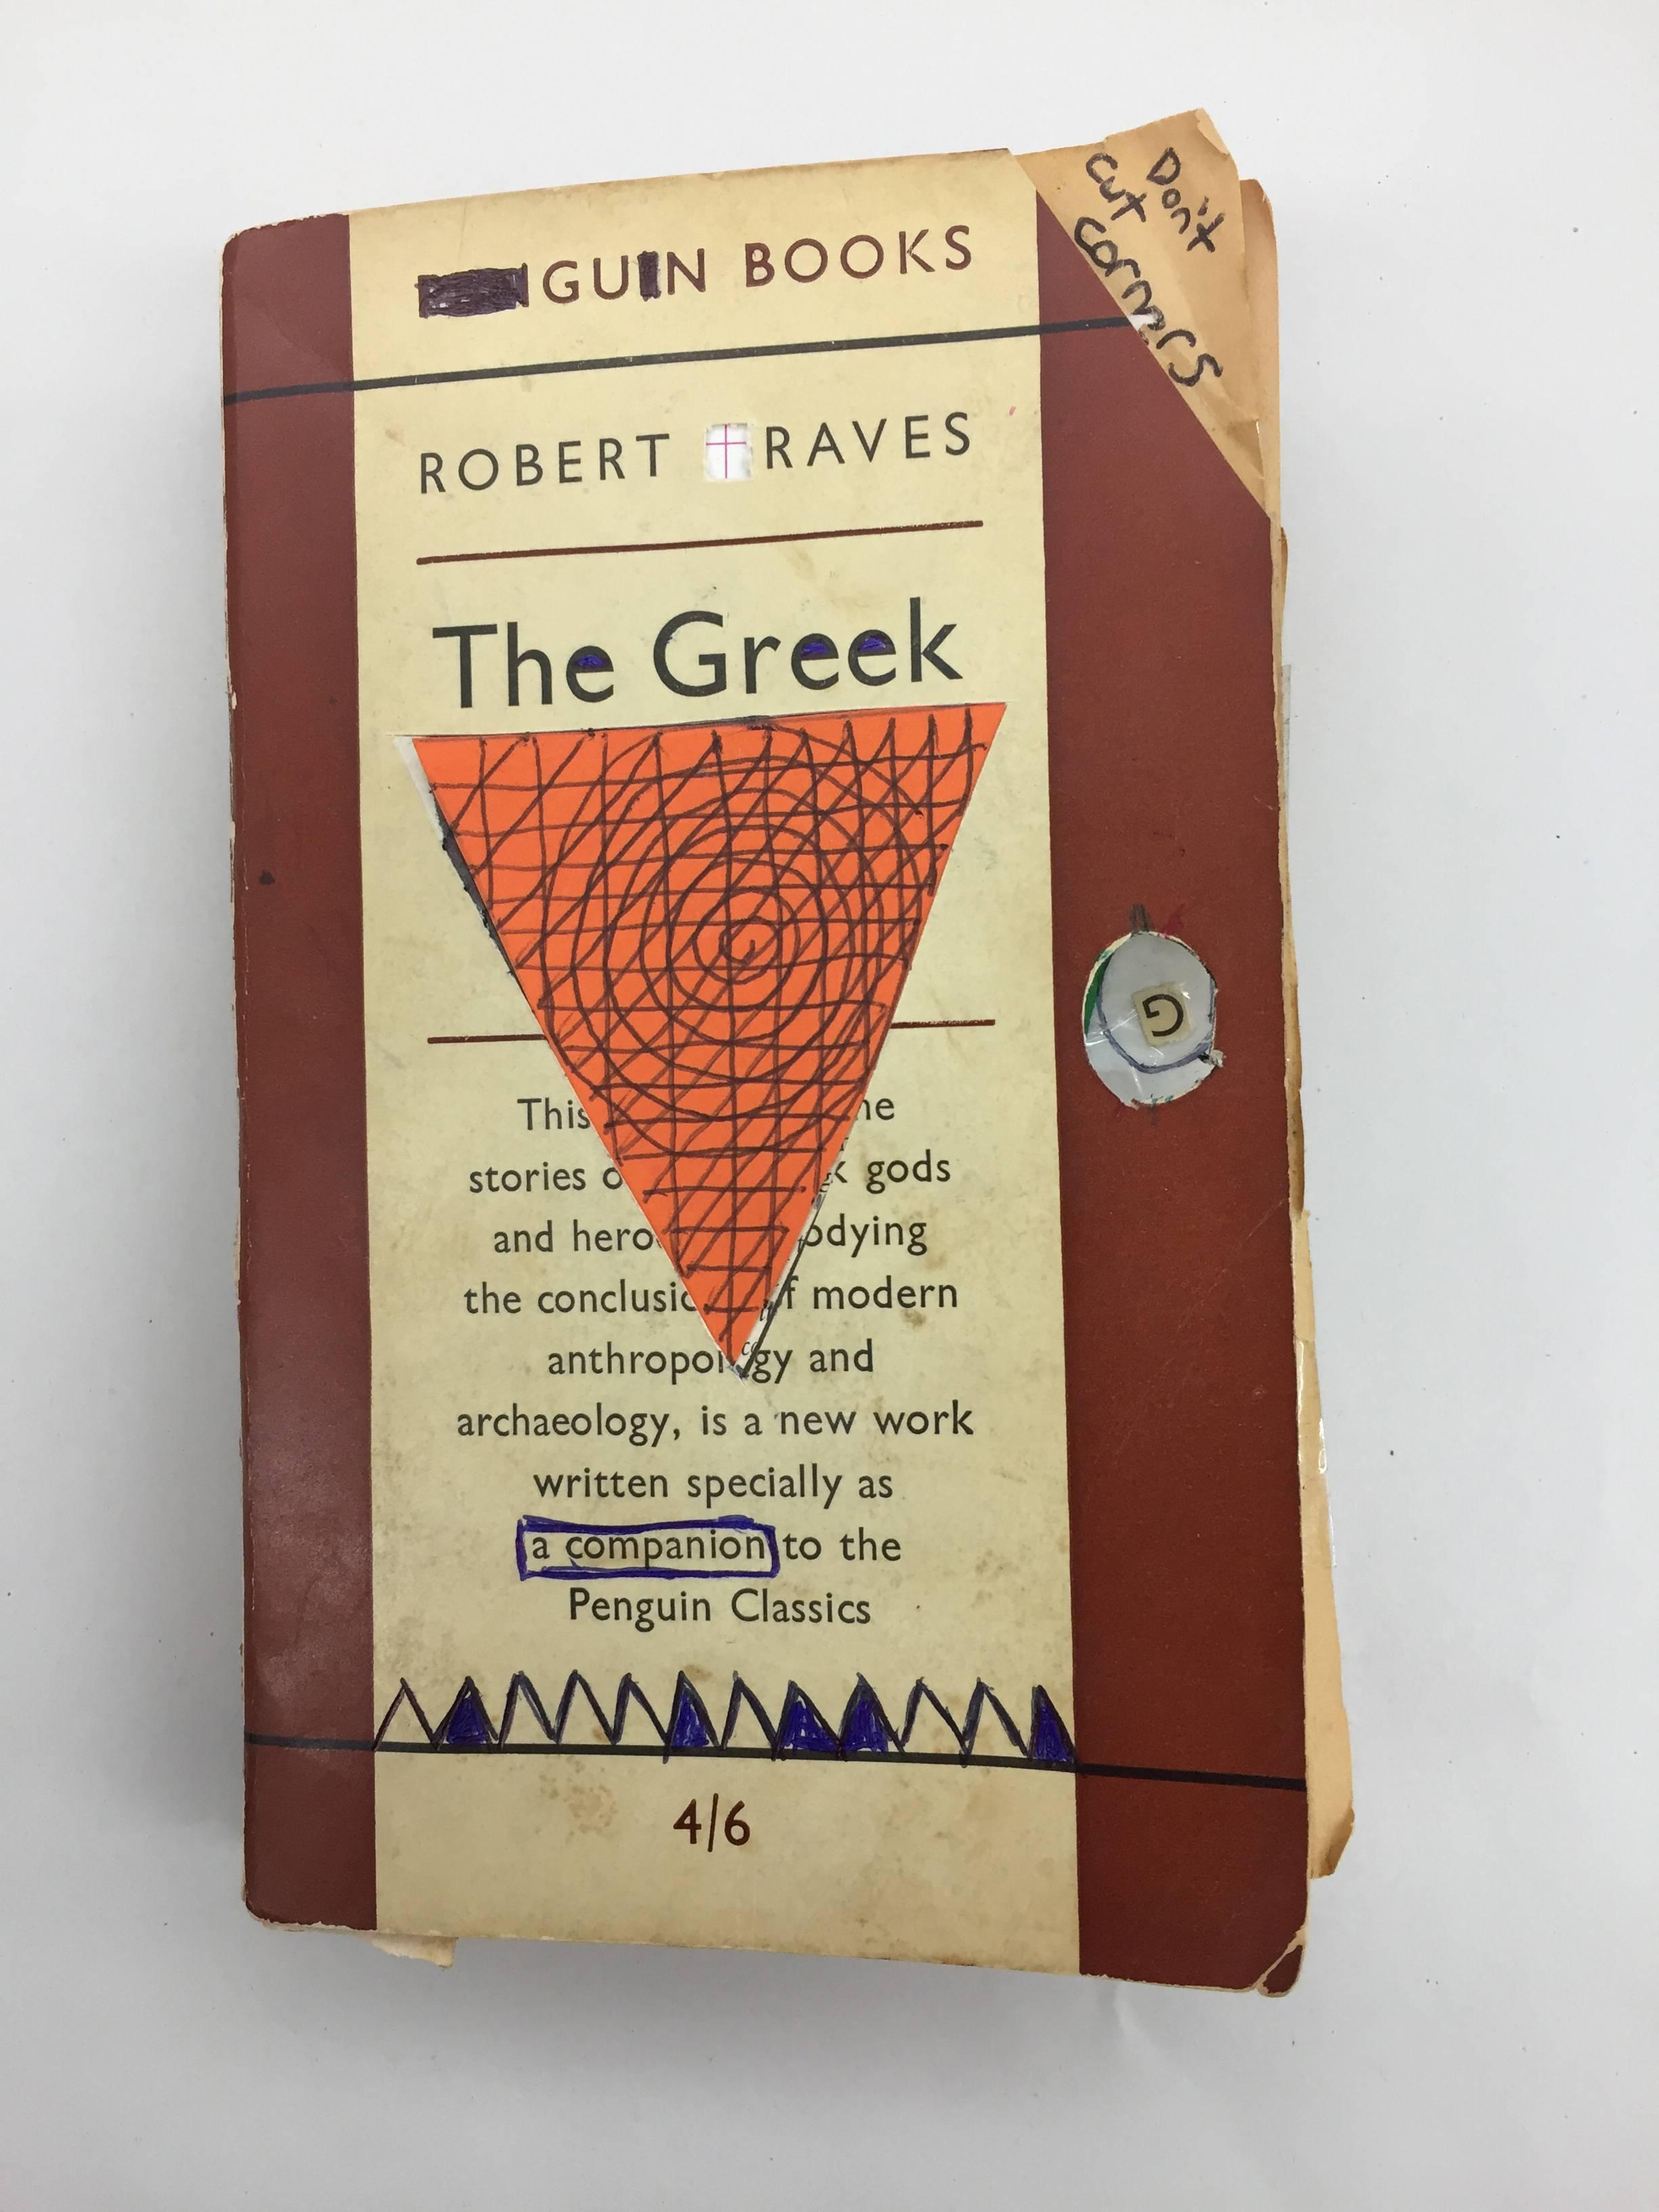 The Greek - book desecration